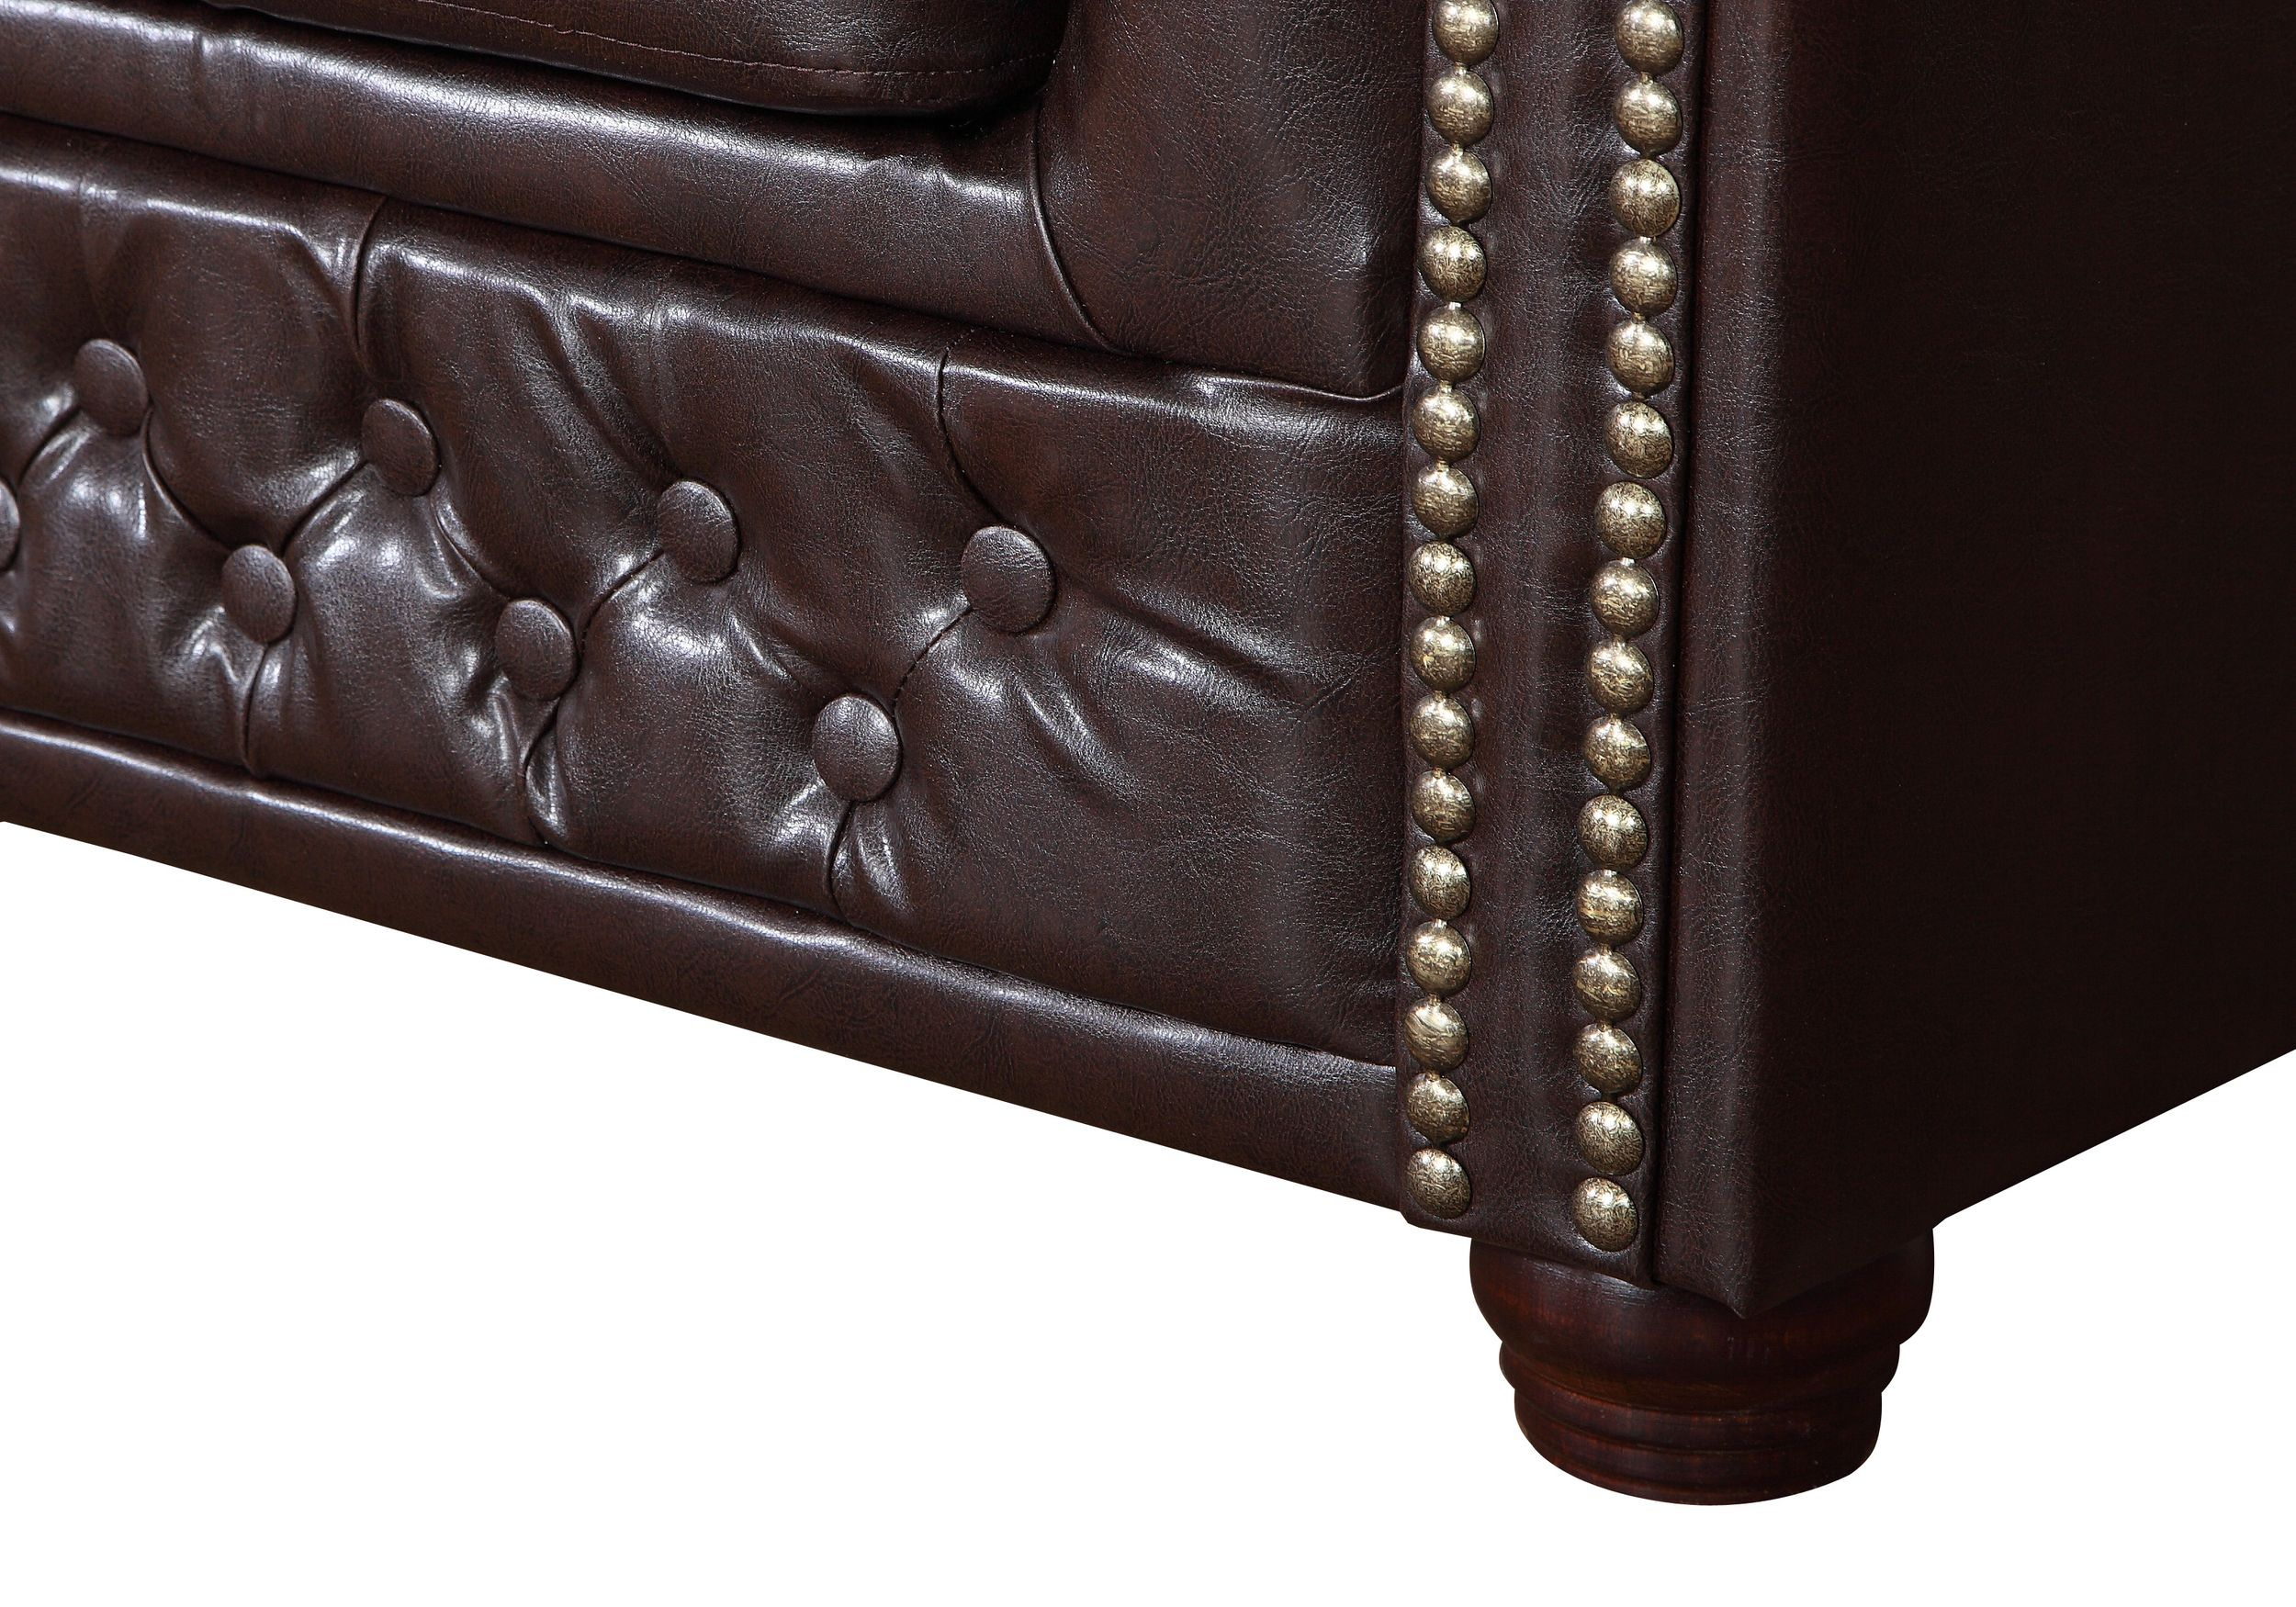 Full Size of Sofa Kunstleder Edles Chesterfield 3 Sitzer In Braun Couch Le Corbusier Canape Hersteller Dauerschläfer Big Schlafsofa Liegefläche 180x200 Ohne Lehne Bezug Sofa Sofa Kunstleder